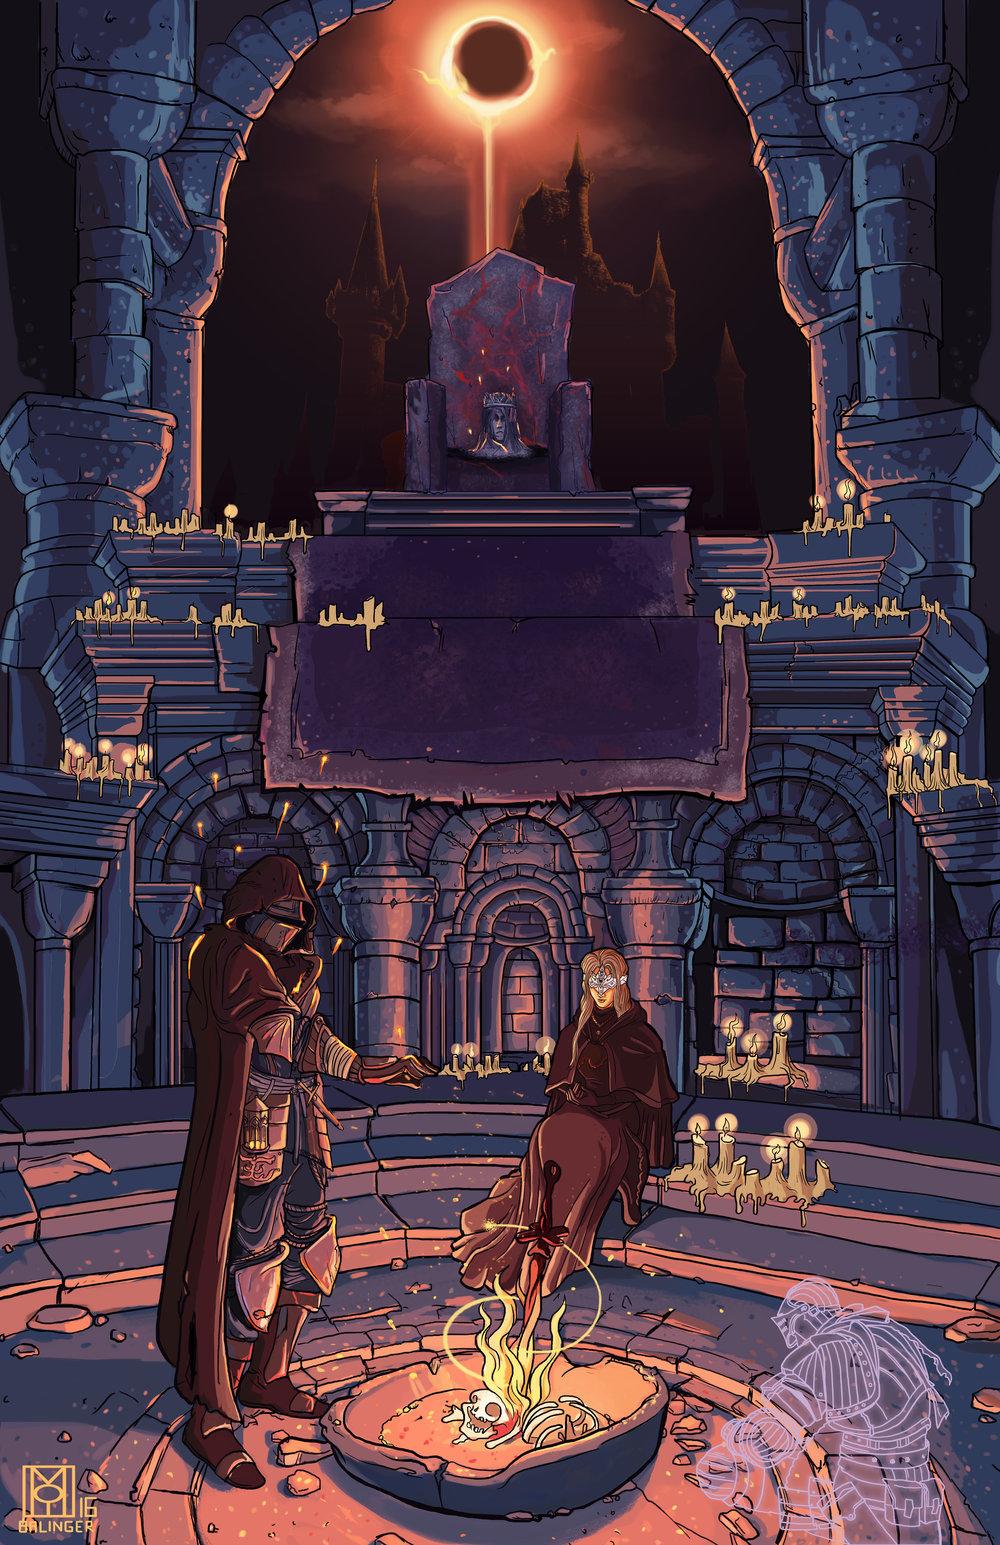 The Firelink Shrine